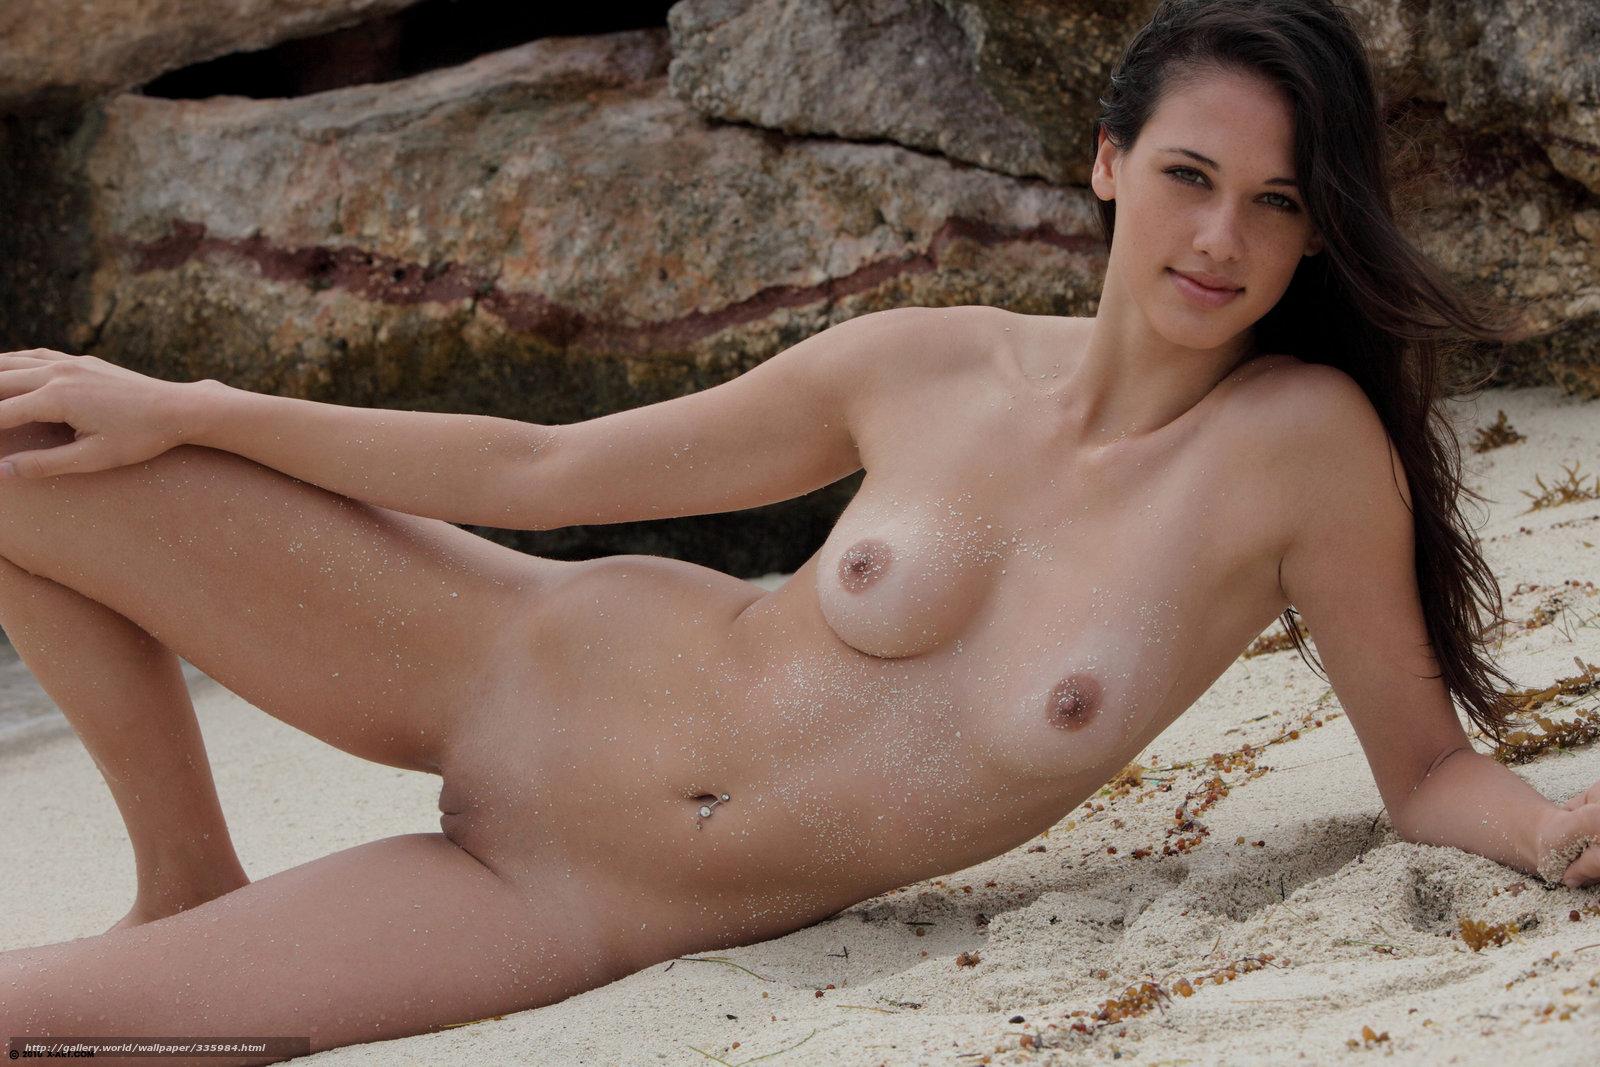 Eng ful nud girls image porn tit